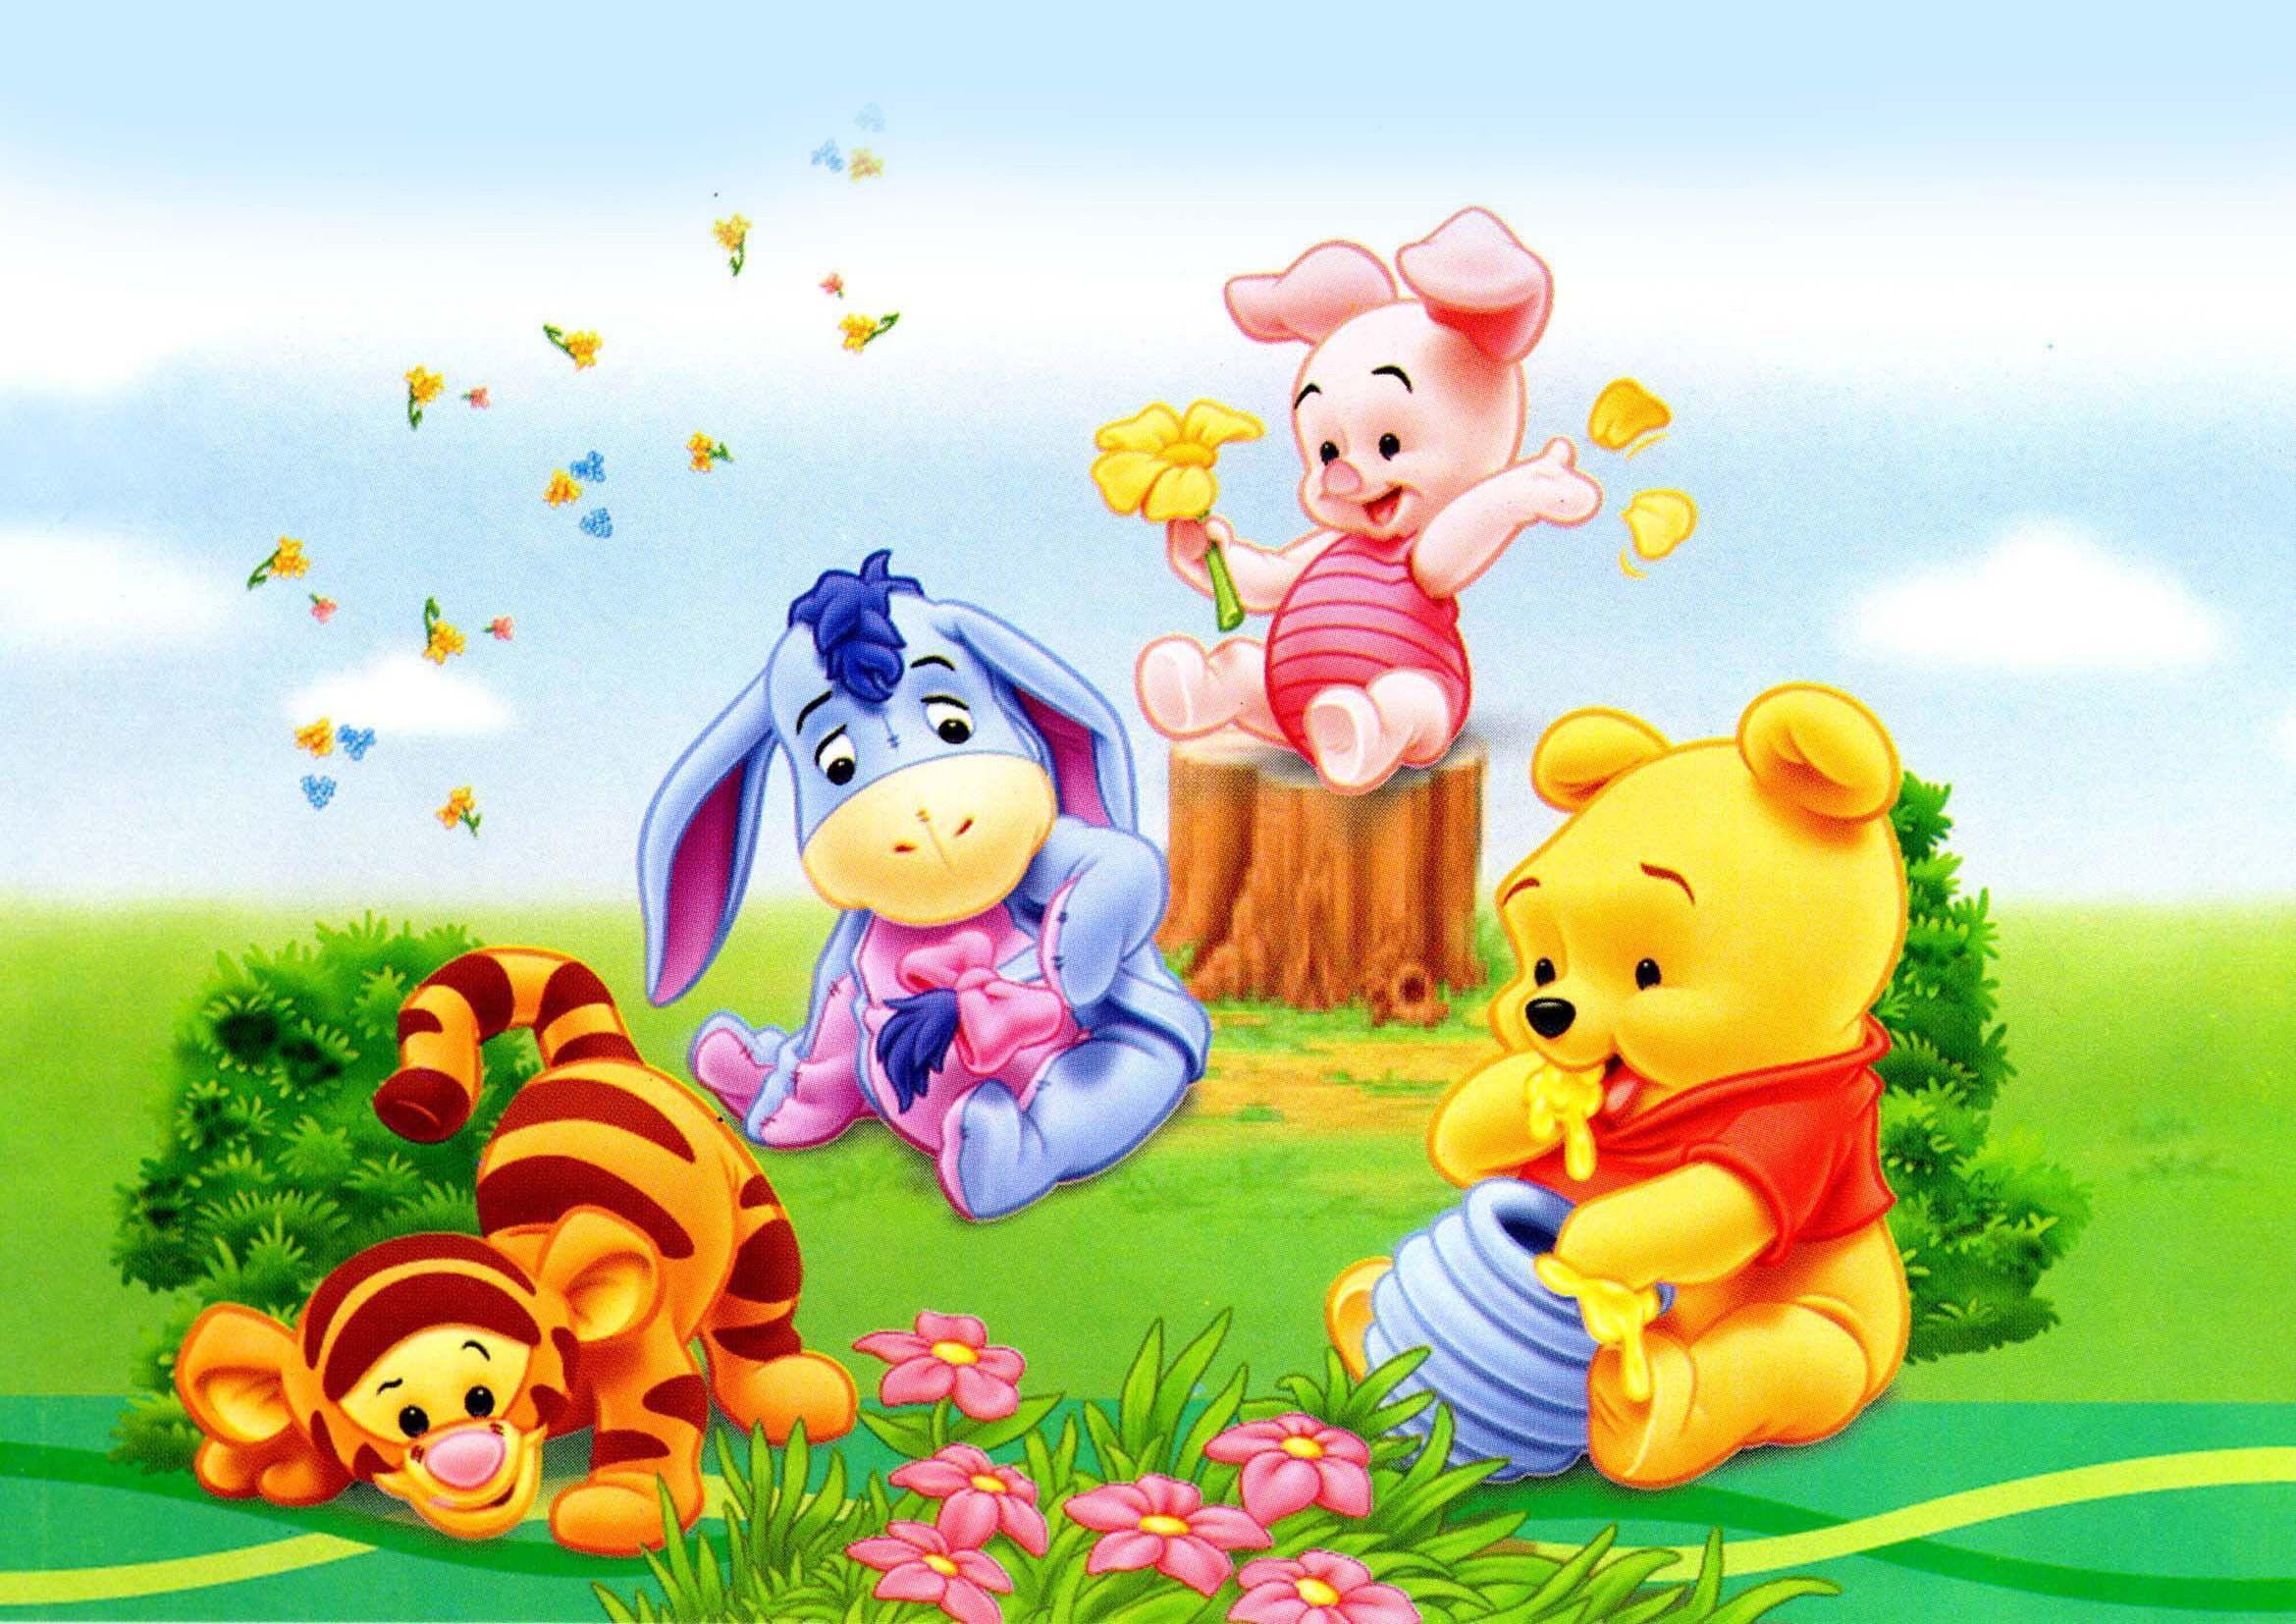 Pooh Bear Wallpapers Wallpaper Cave